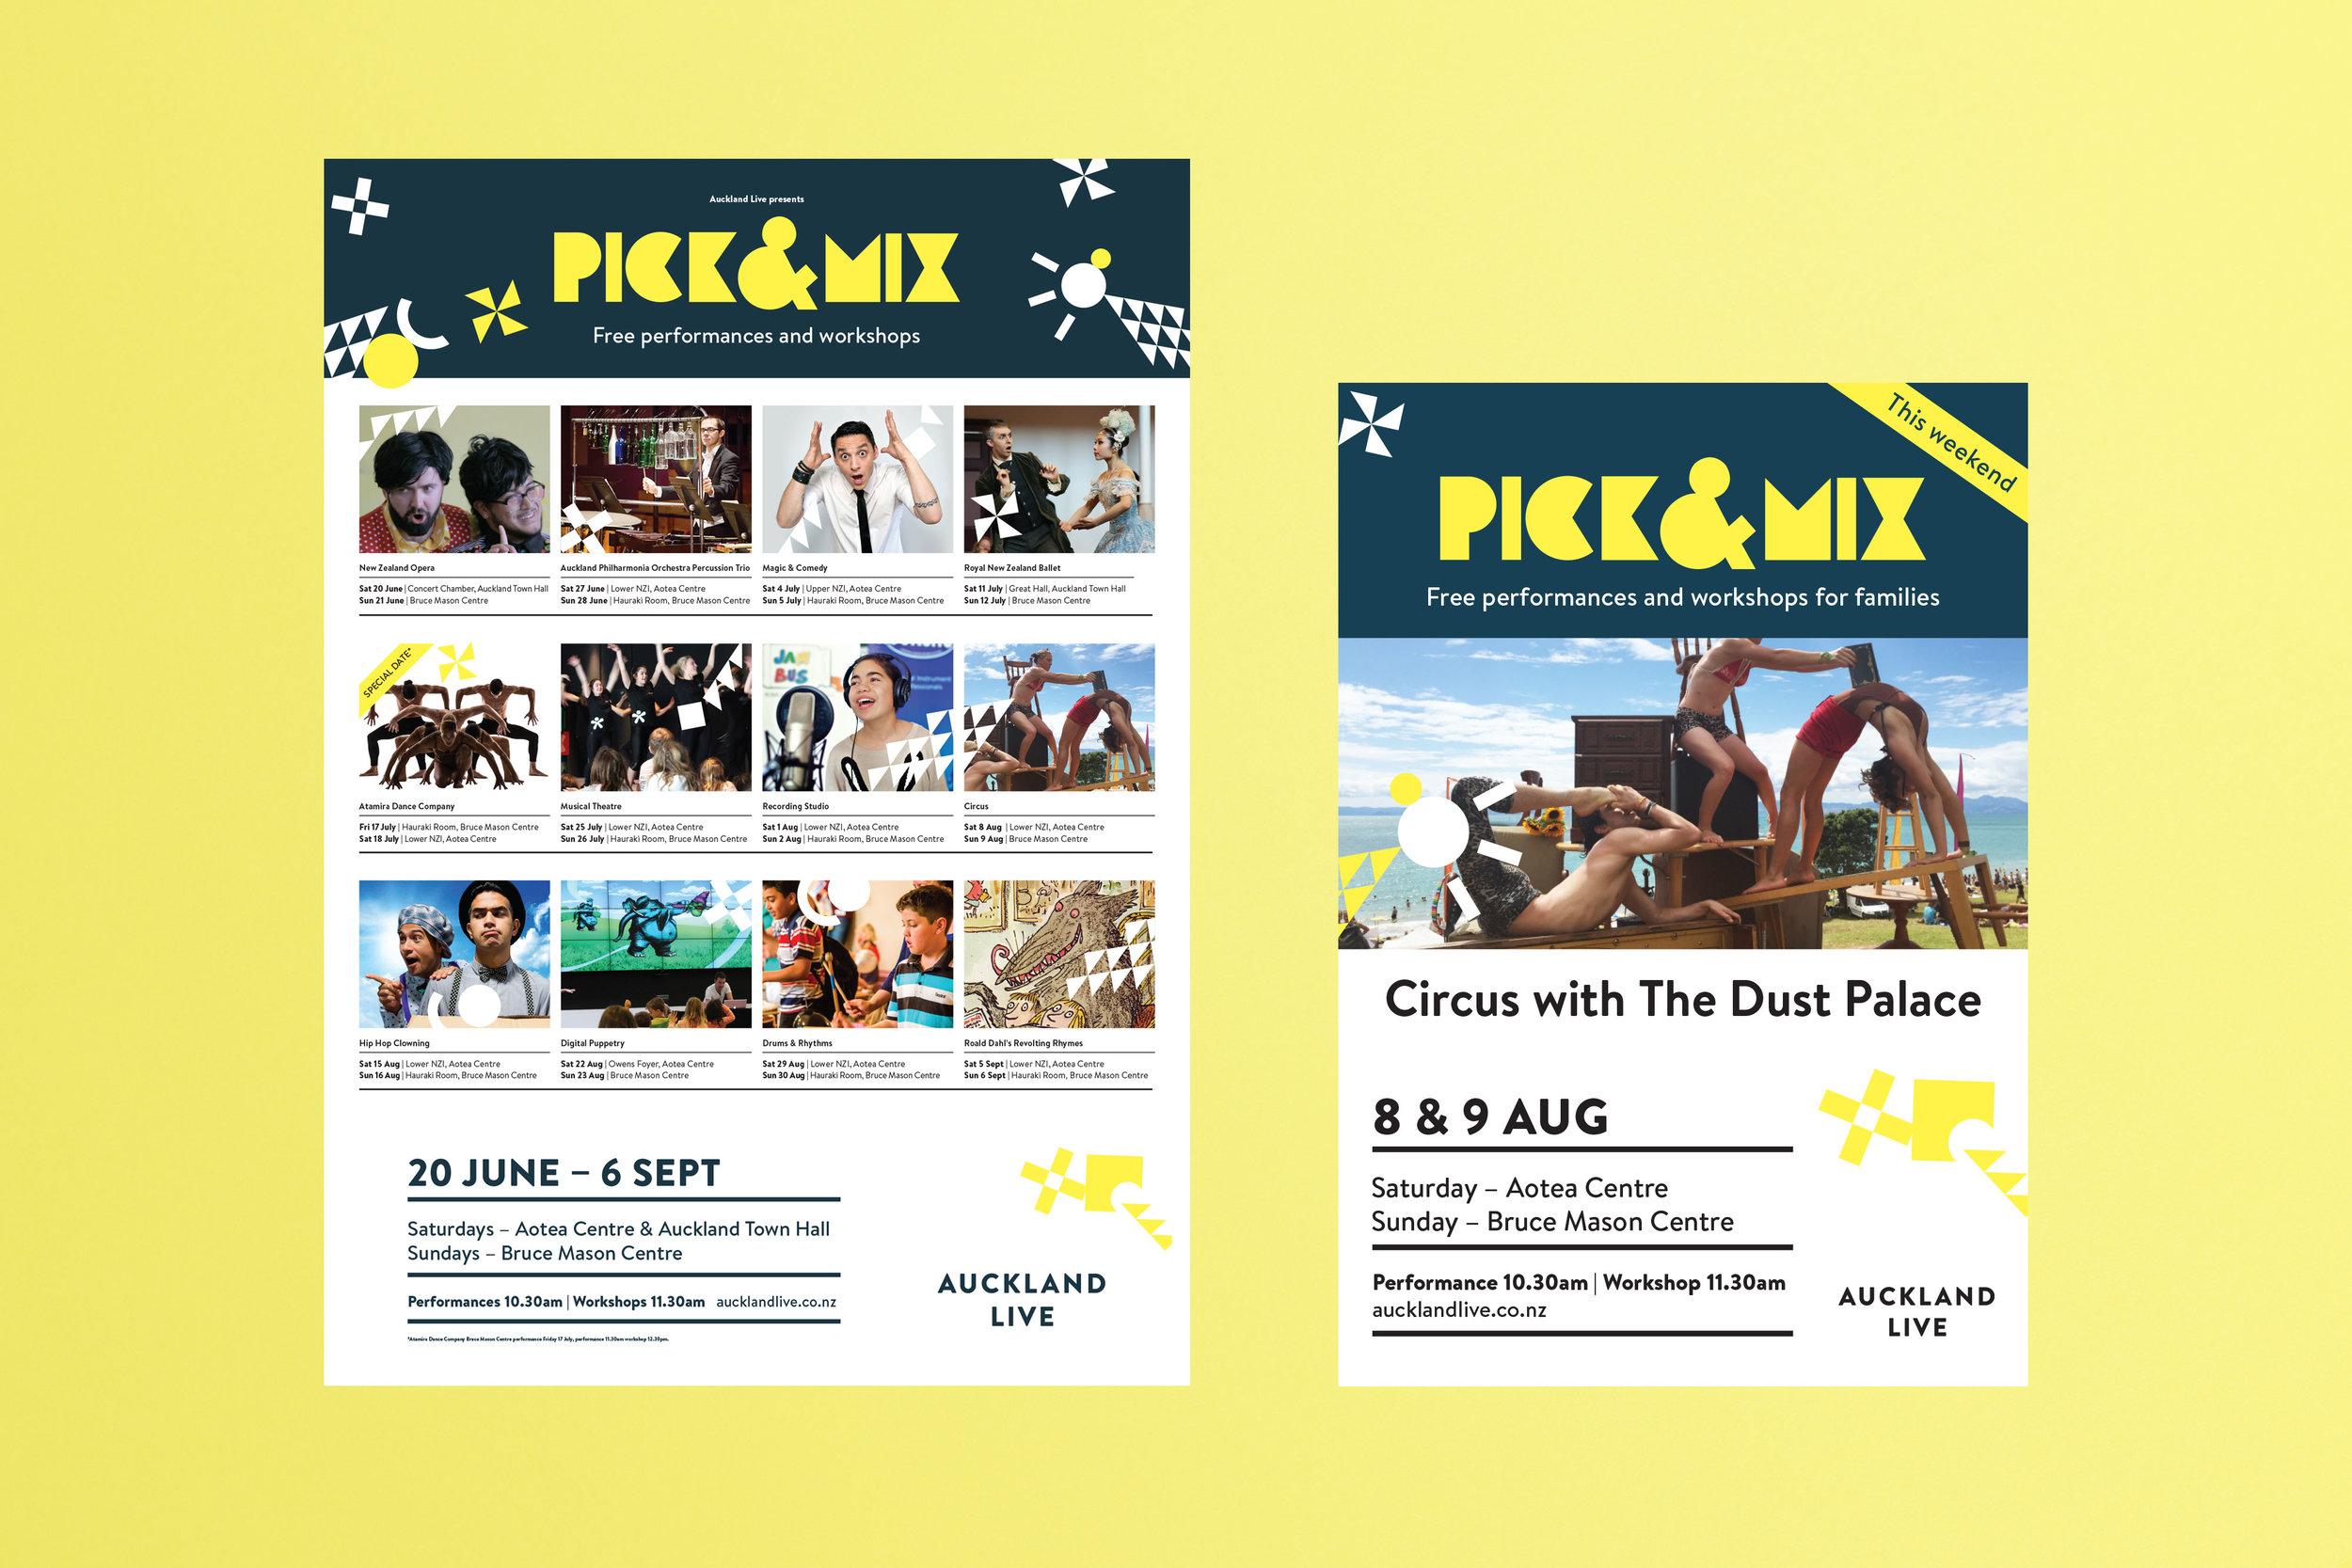 P&M-Ads.jpg